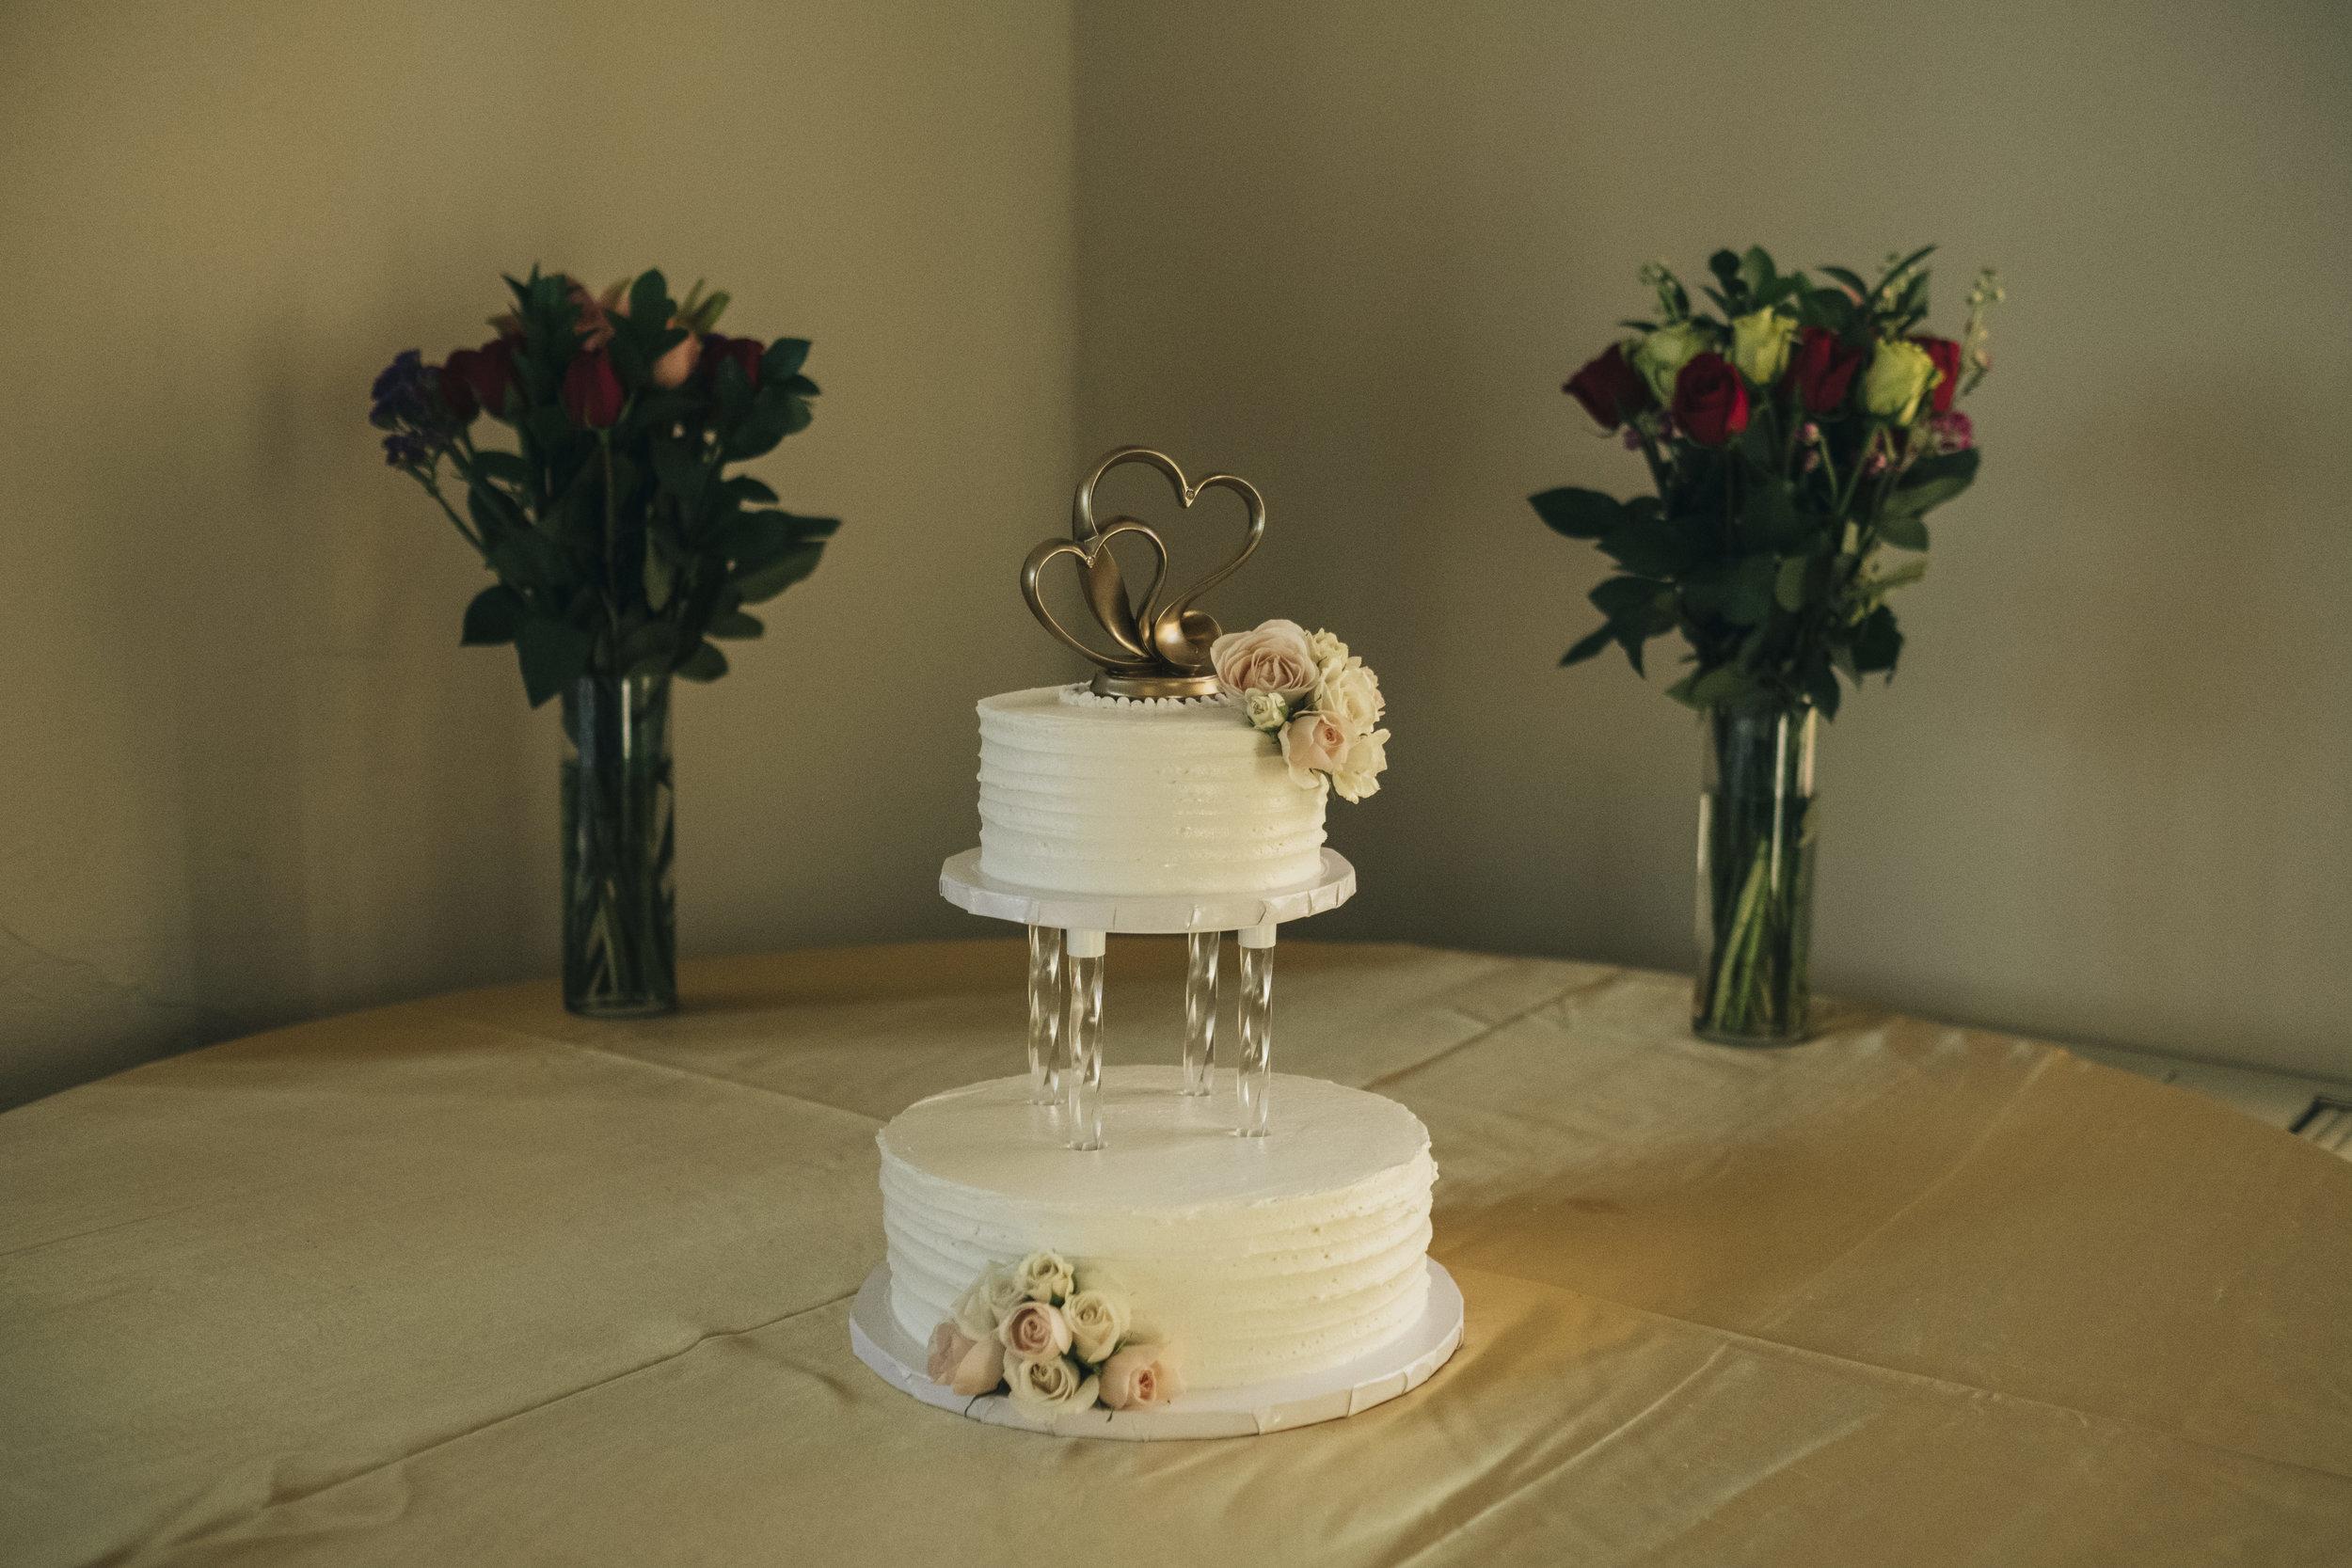 Eston's Bakery wedding cake at Nazareth Hall wedding.